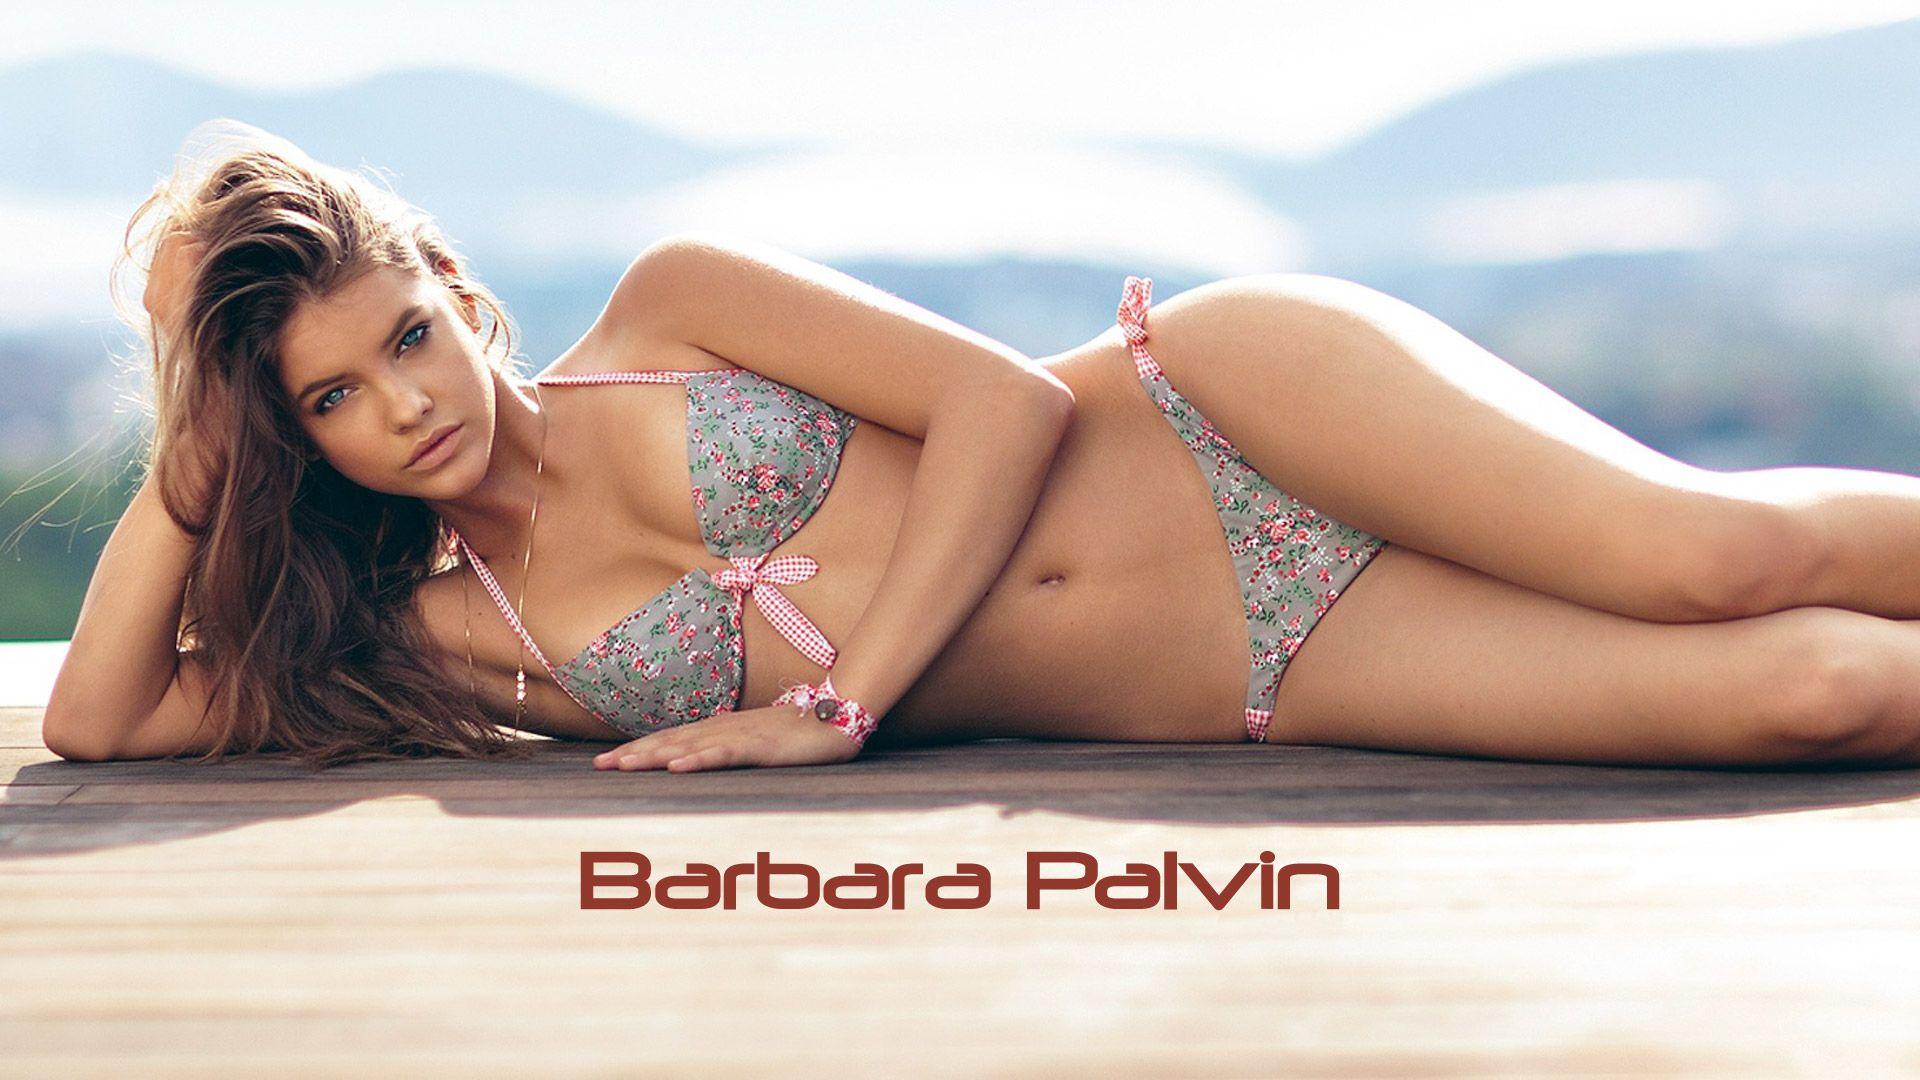 barbara palvin bold hot wallpaper | barbara palvin | pinterest